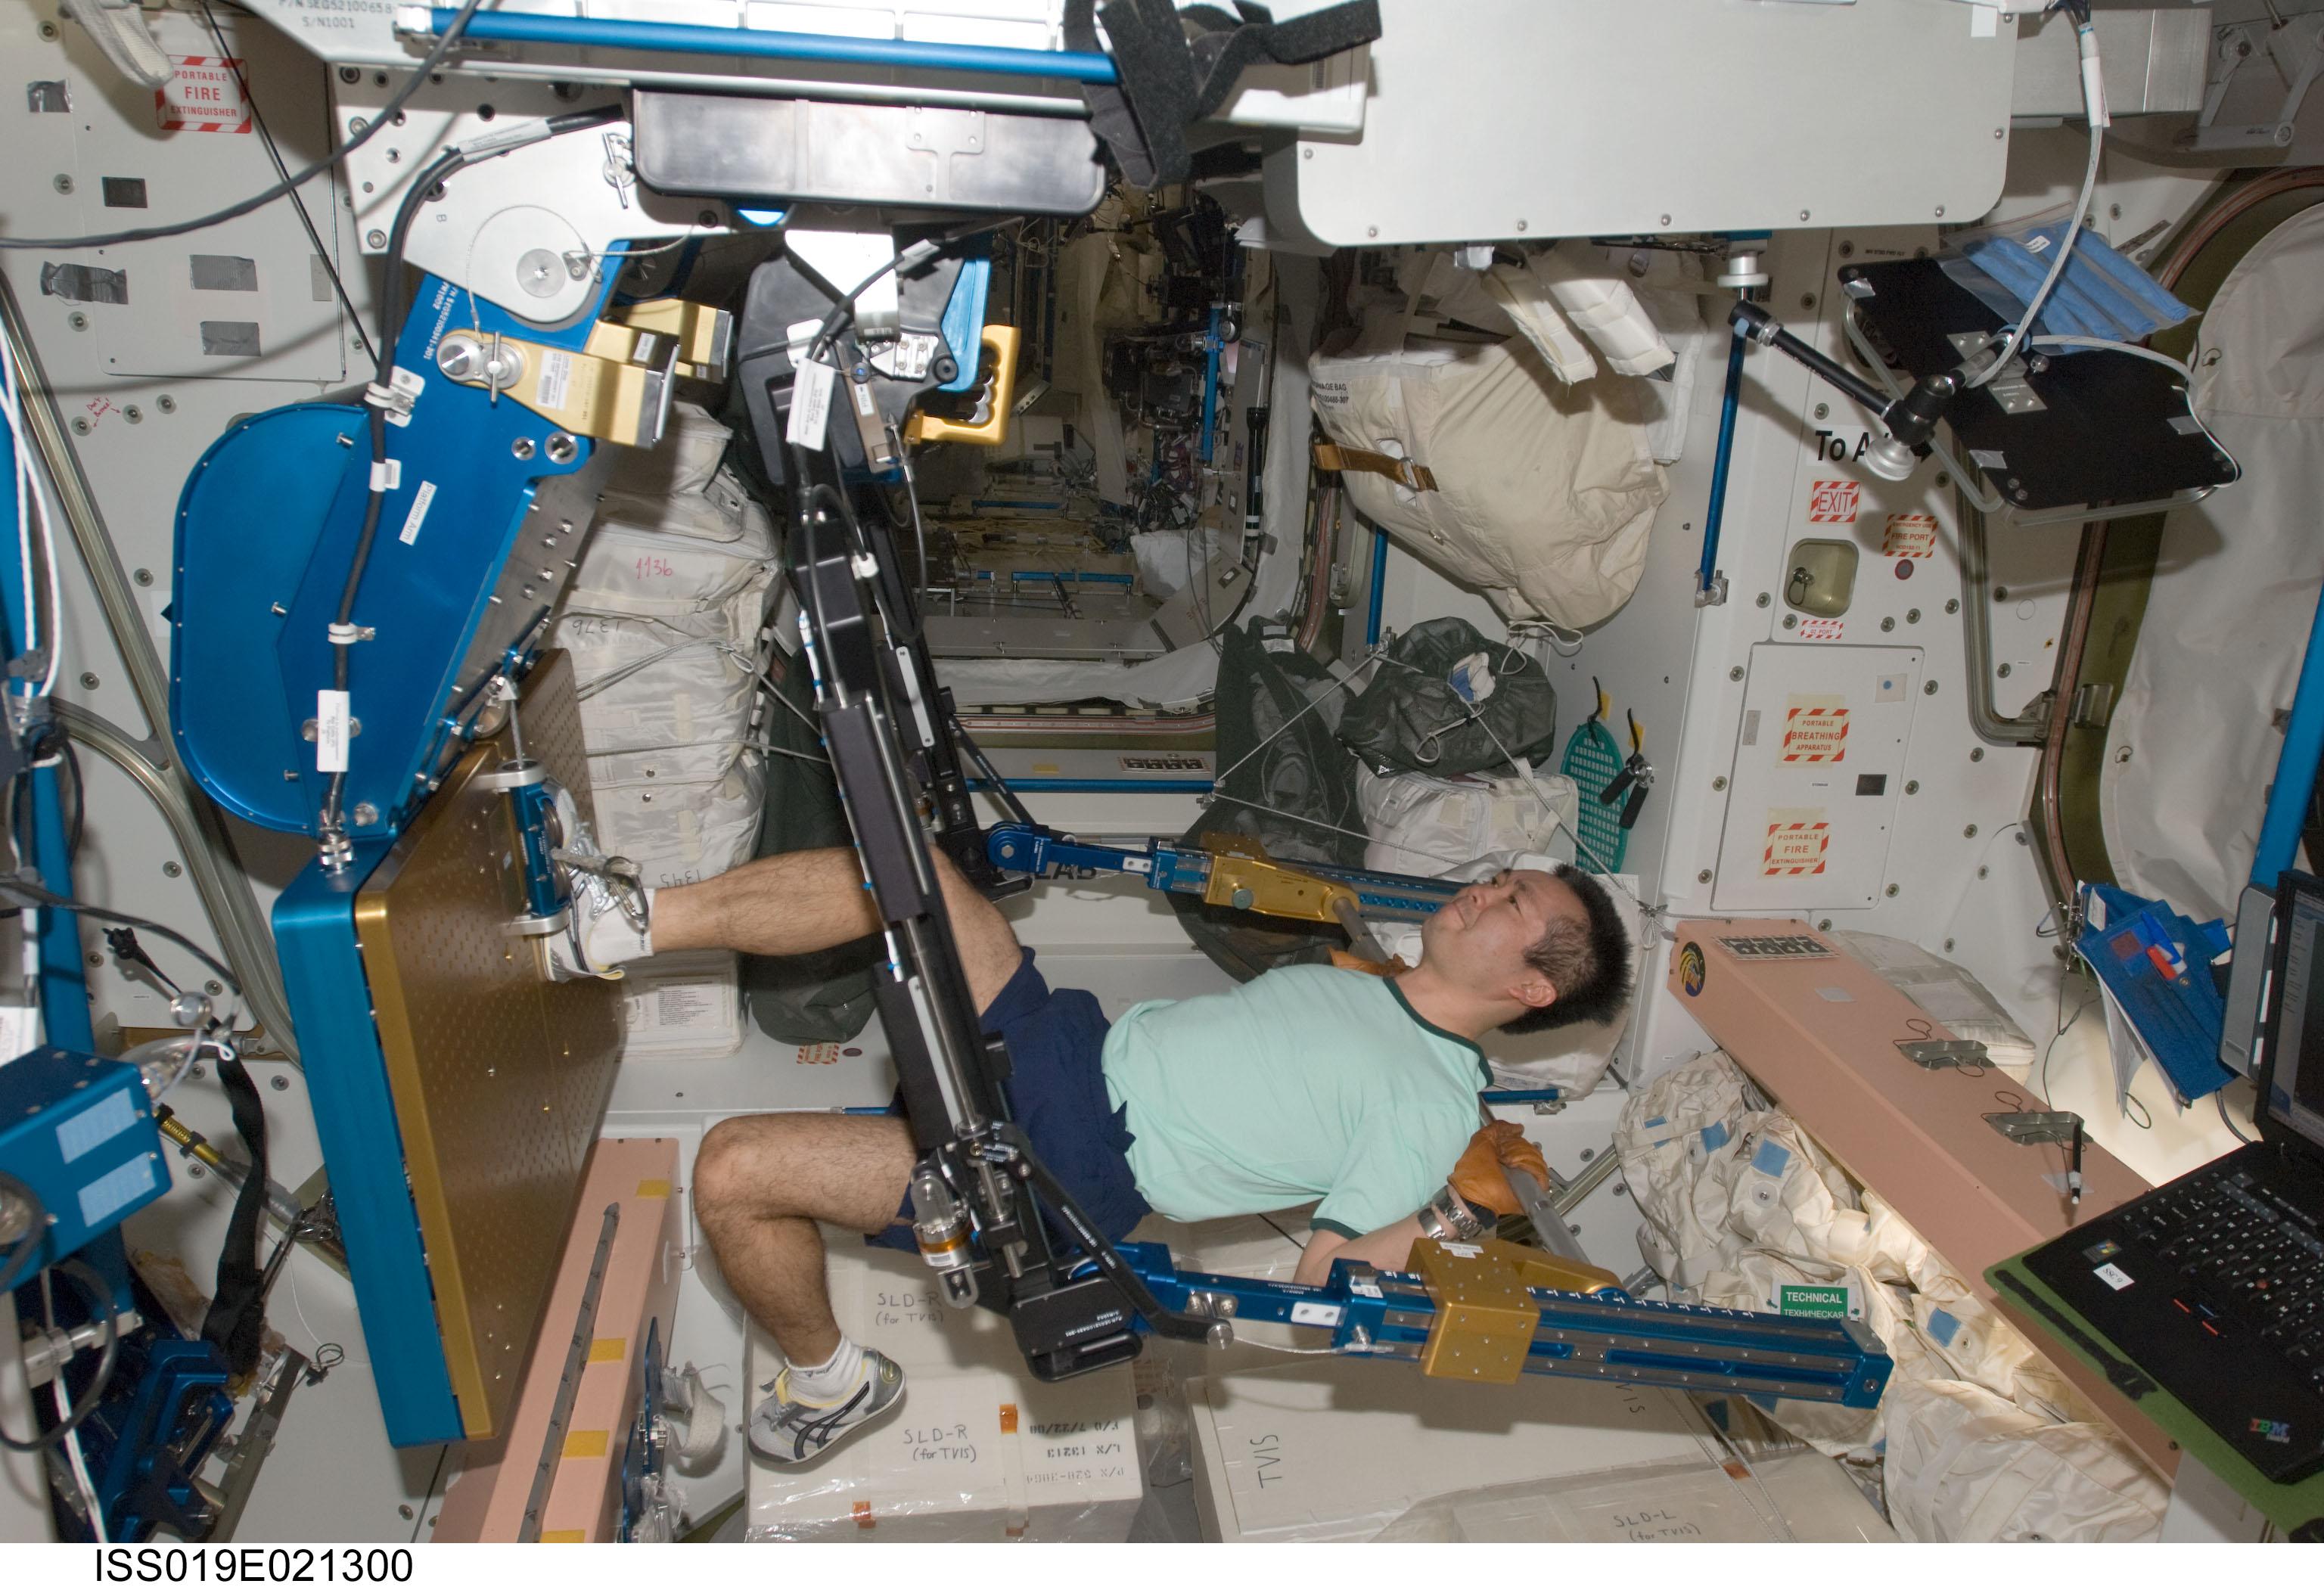 astronauts sleeping compartment - photo #16